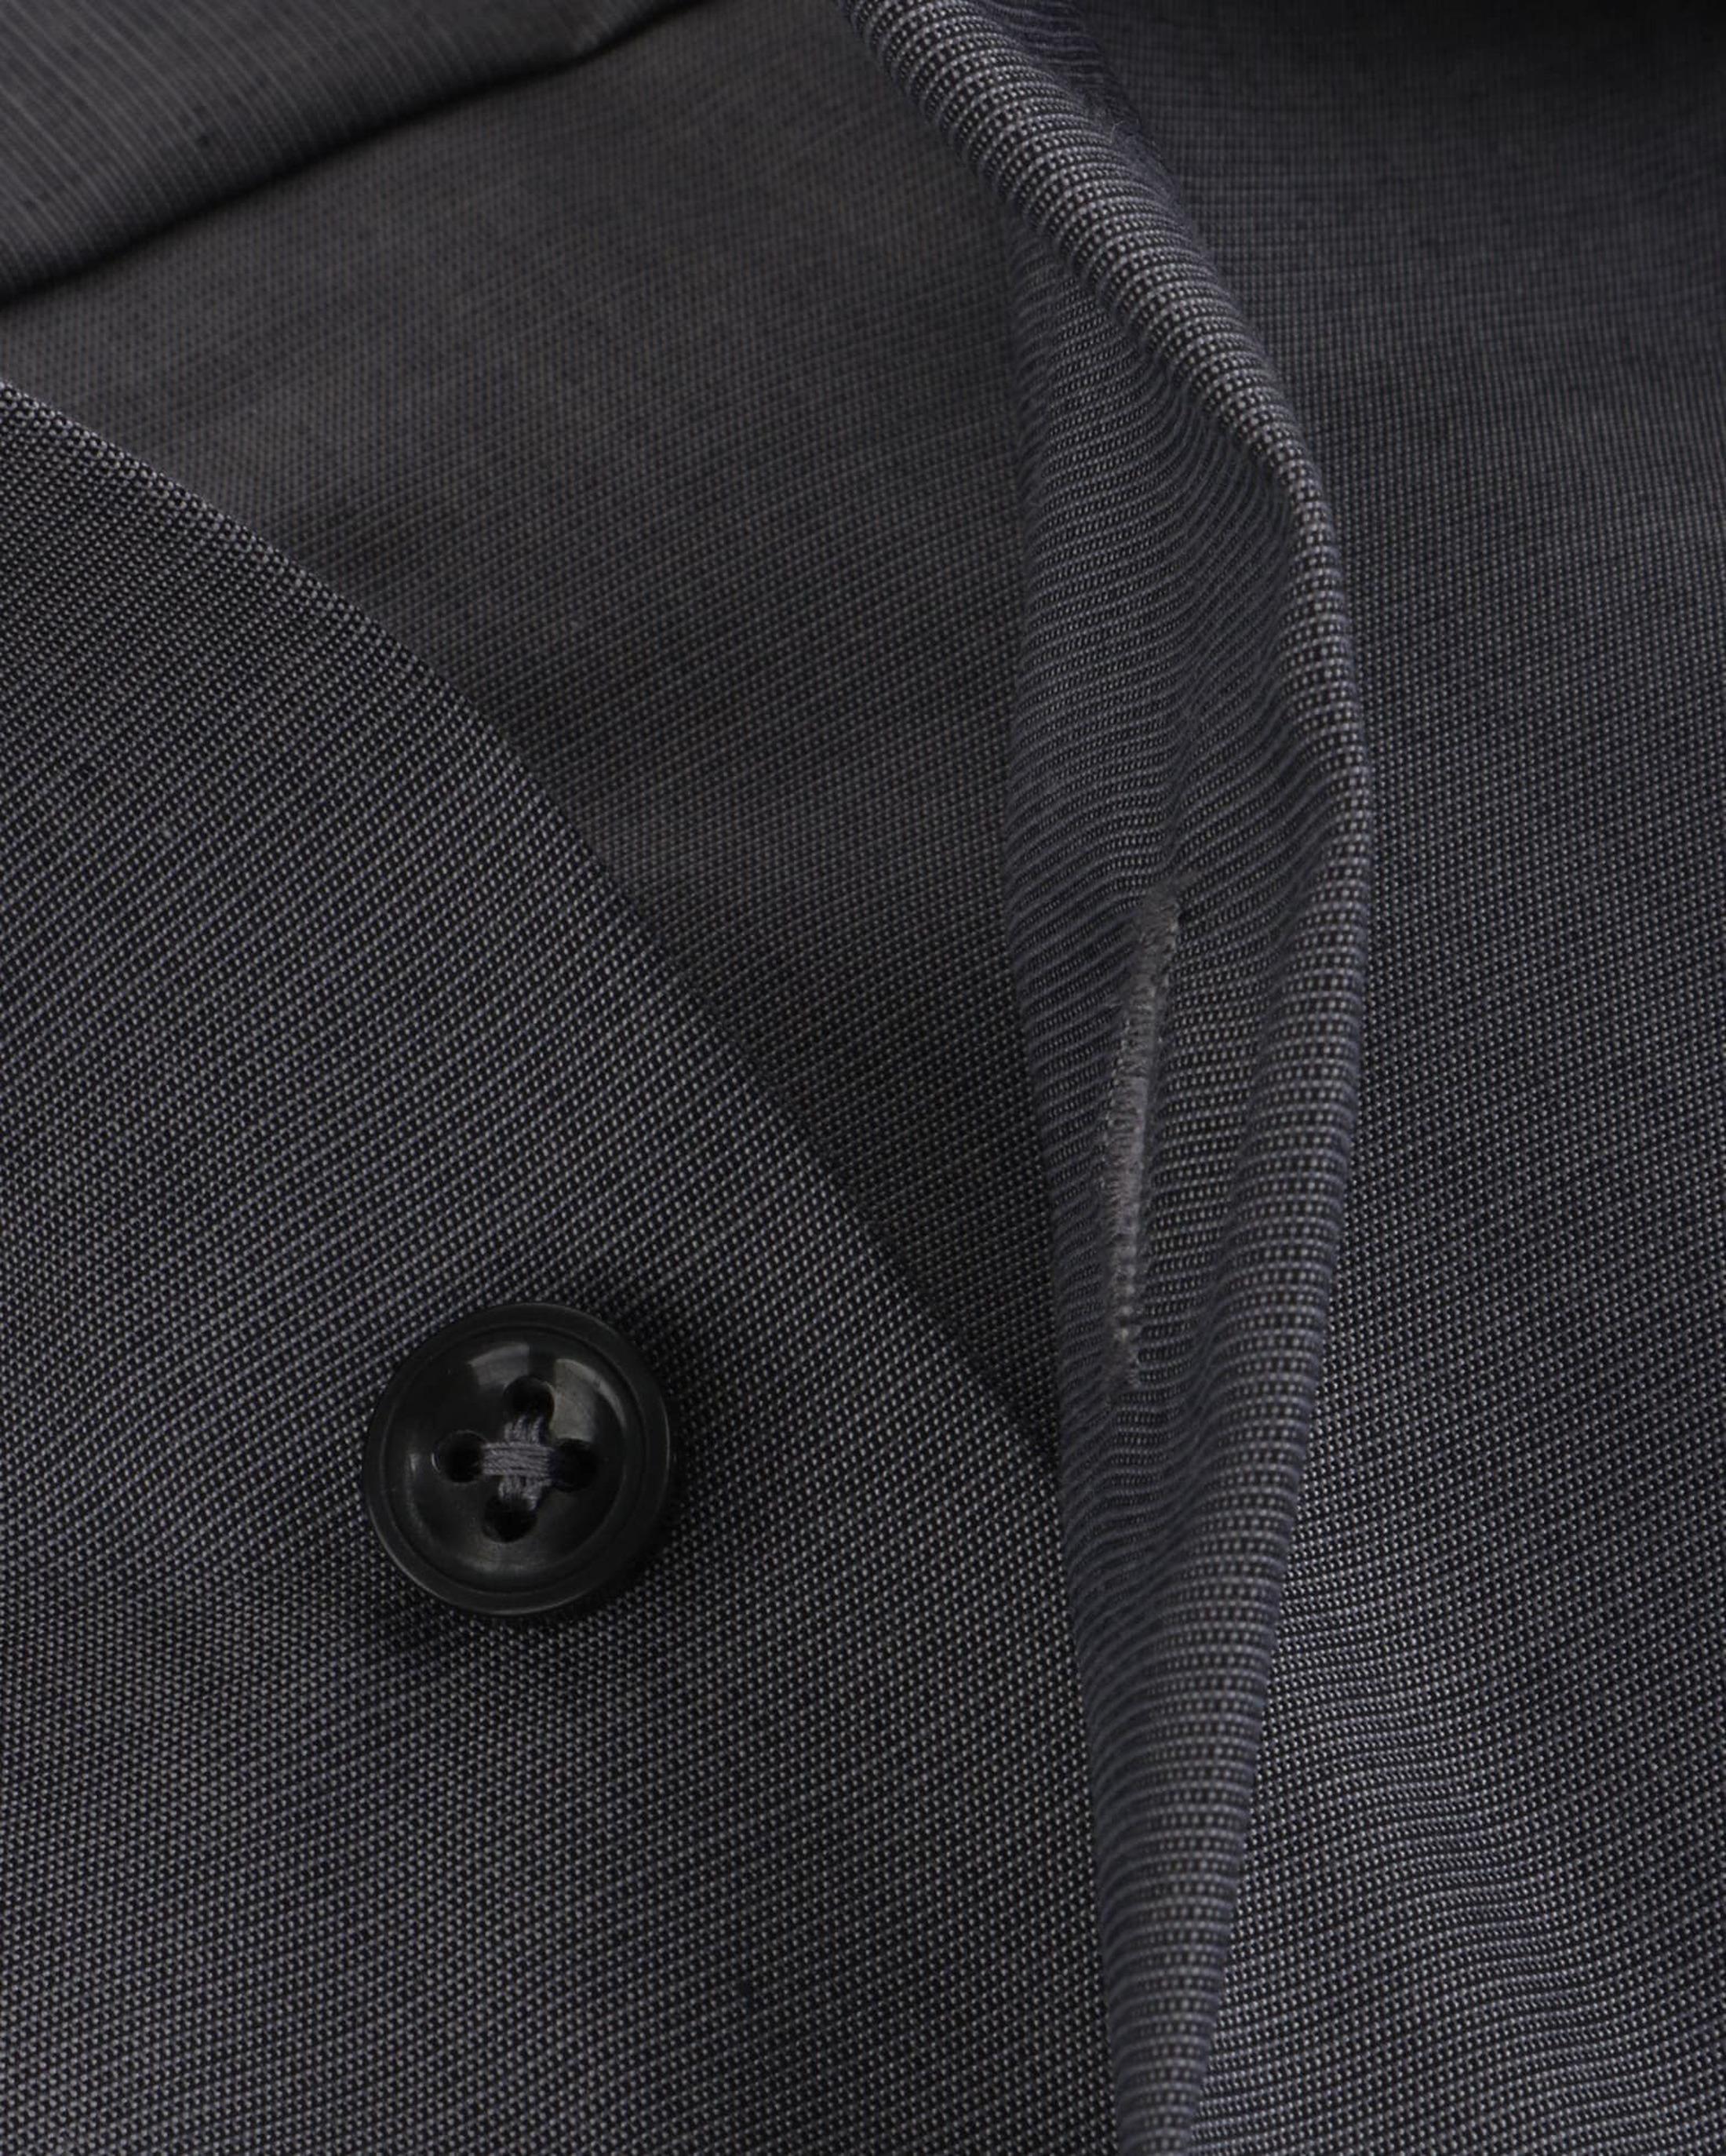 Seidensticker Overhemd Regular Fit Antraciet foto 1